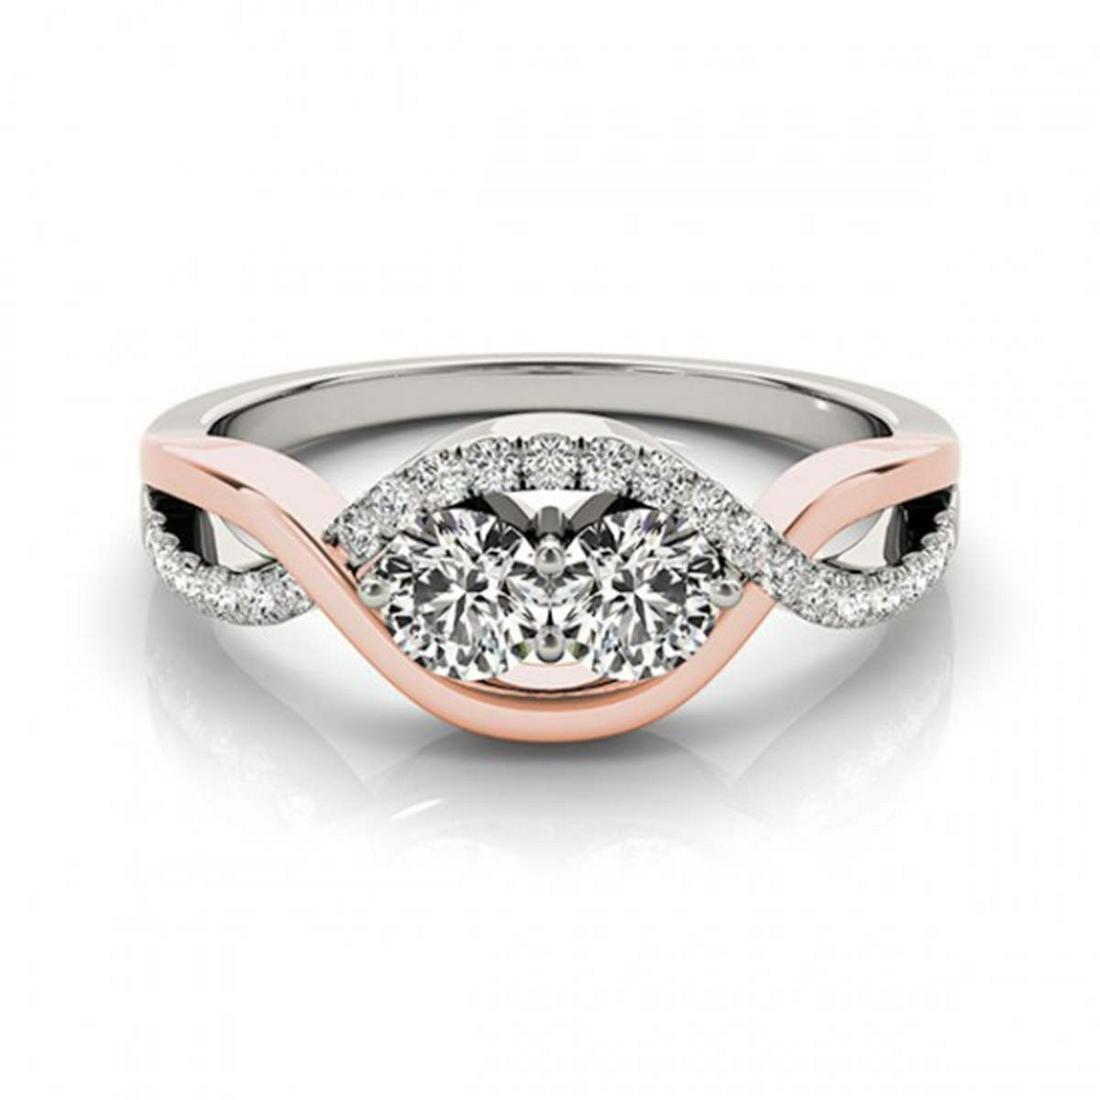 1.25 ctw VS/SI Diamond 2 Stone Ring 14K White & Rose